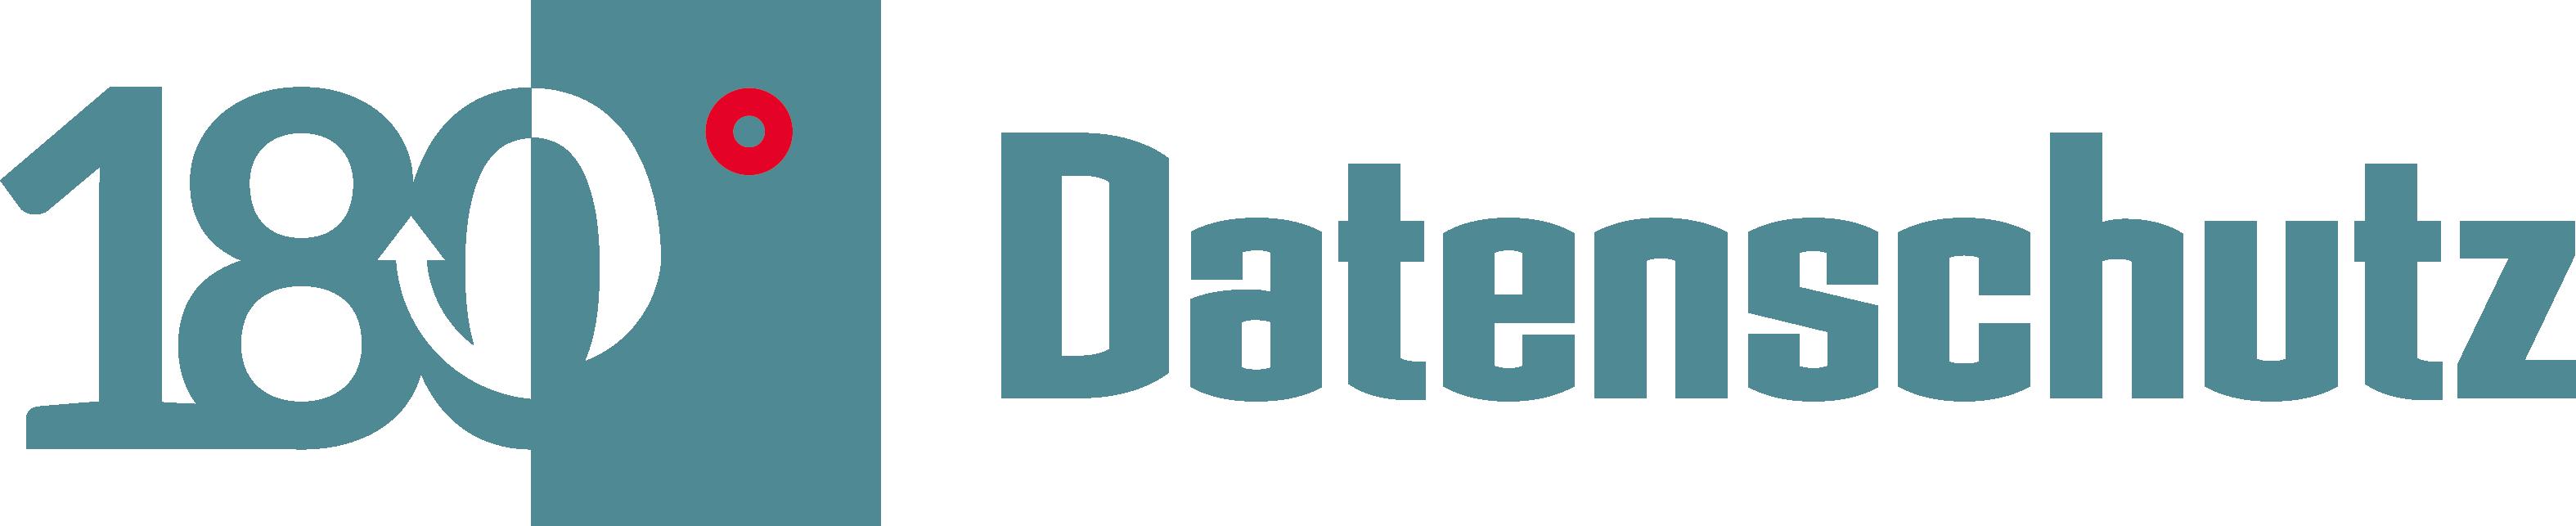 180daten-logo